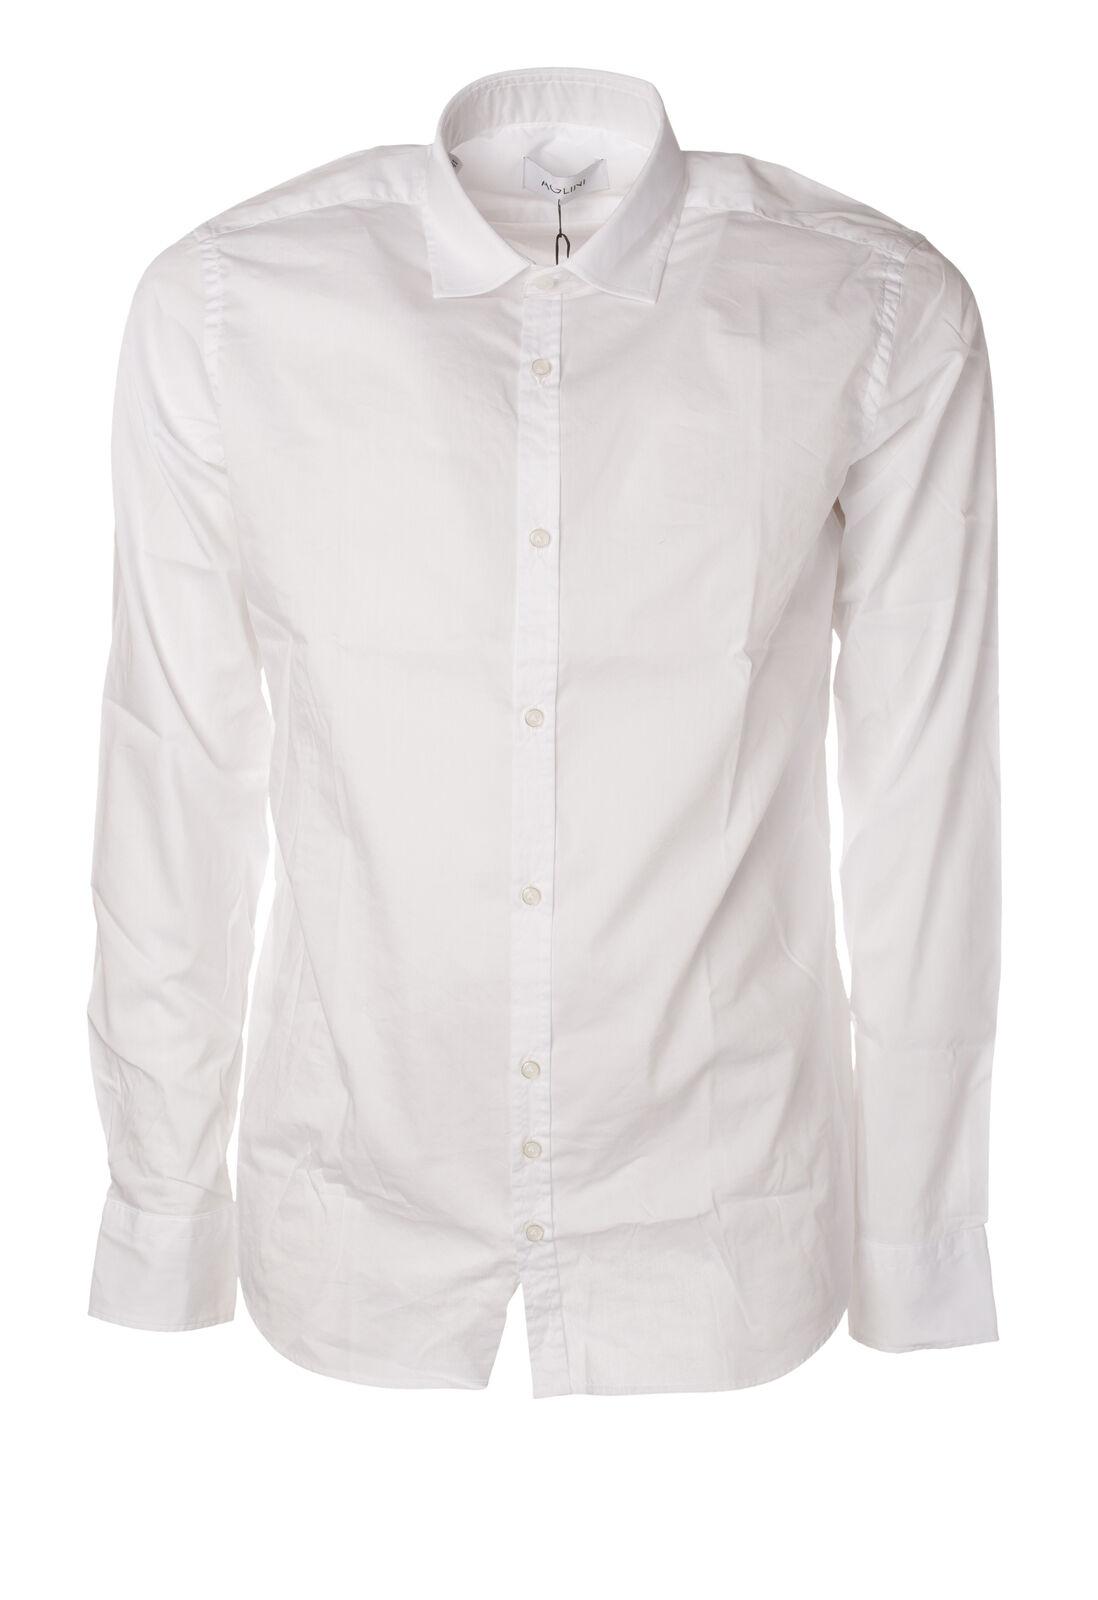 Aglini - Shirts-Shirt - Man - White - 5914809C191020